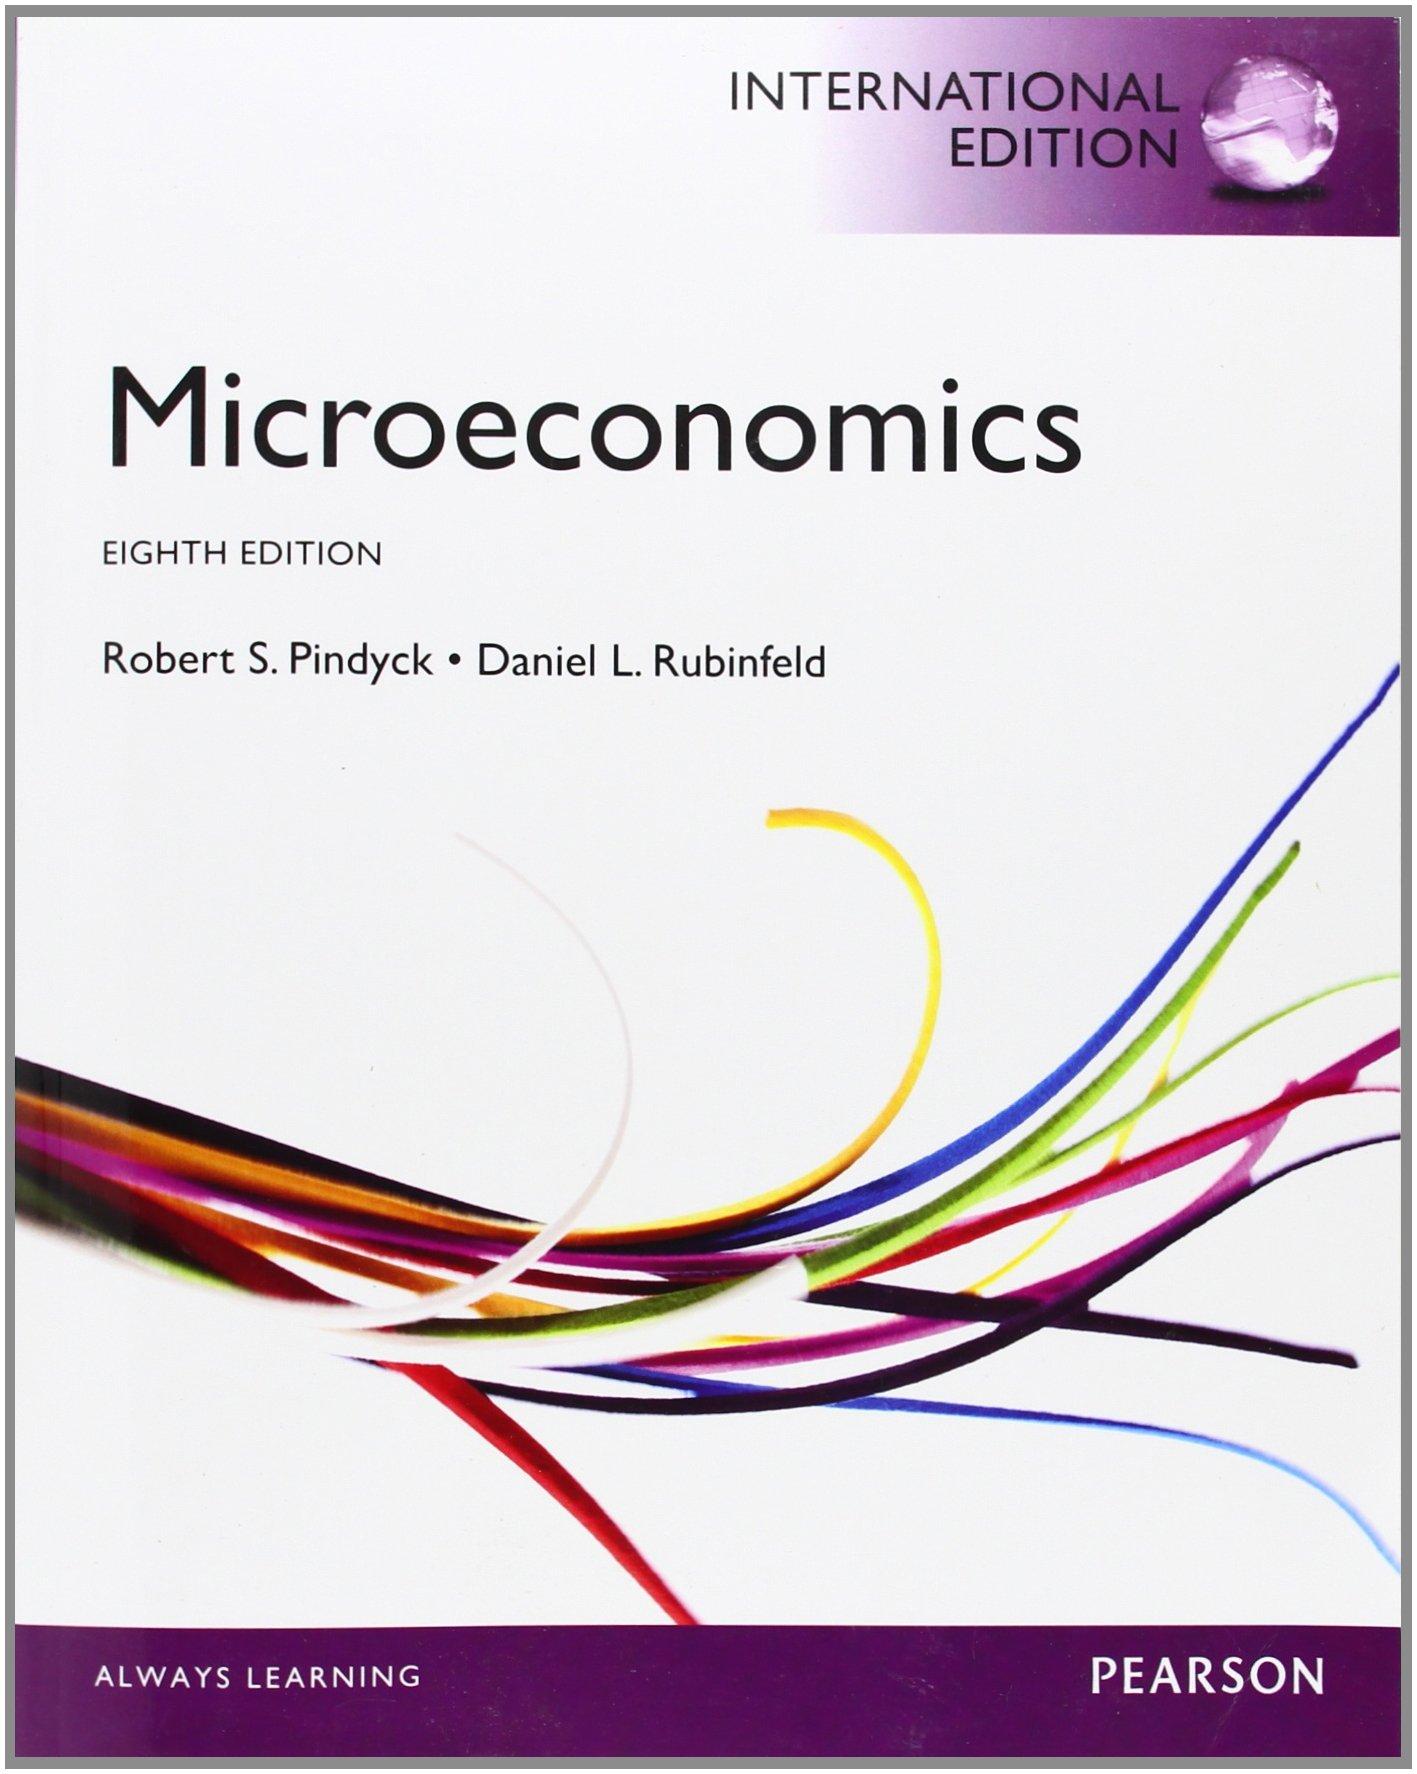 Microeconomics pindyck rubinfeld 7th edition pdf.